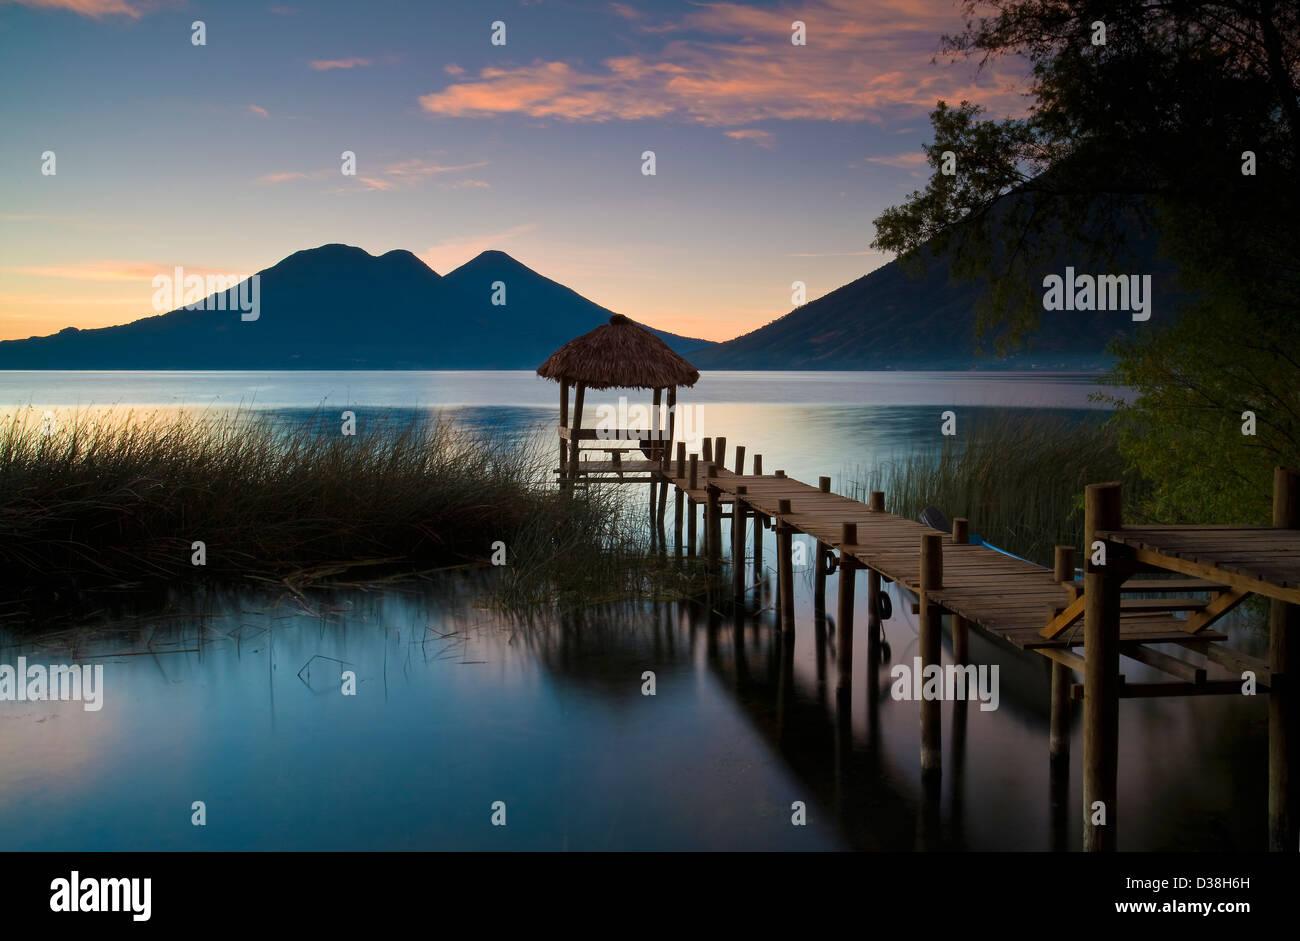 Wooden pier in still lake - Stock Image